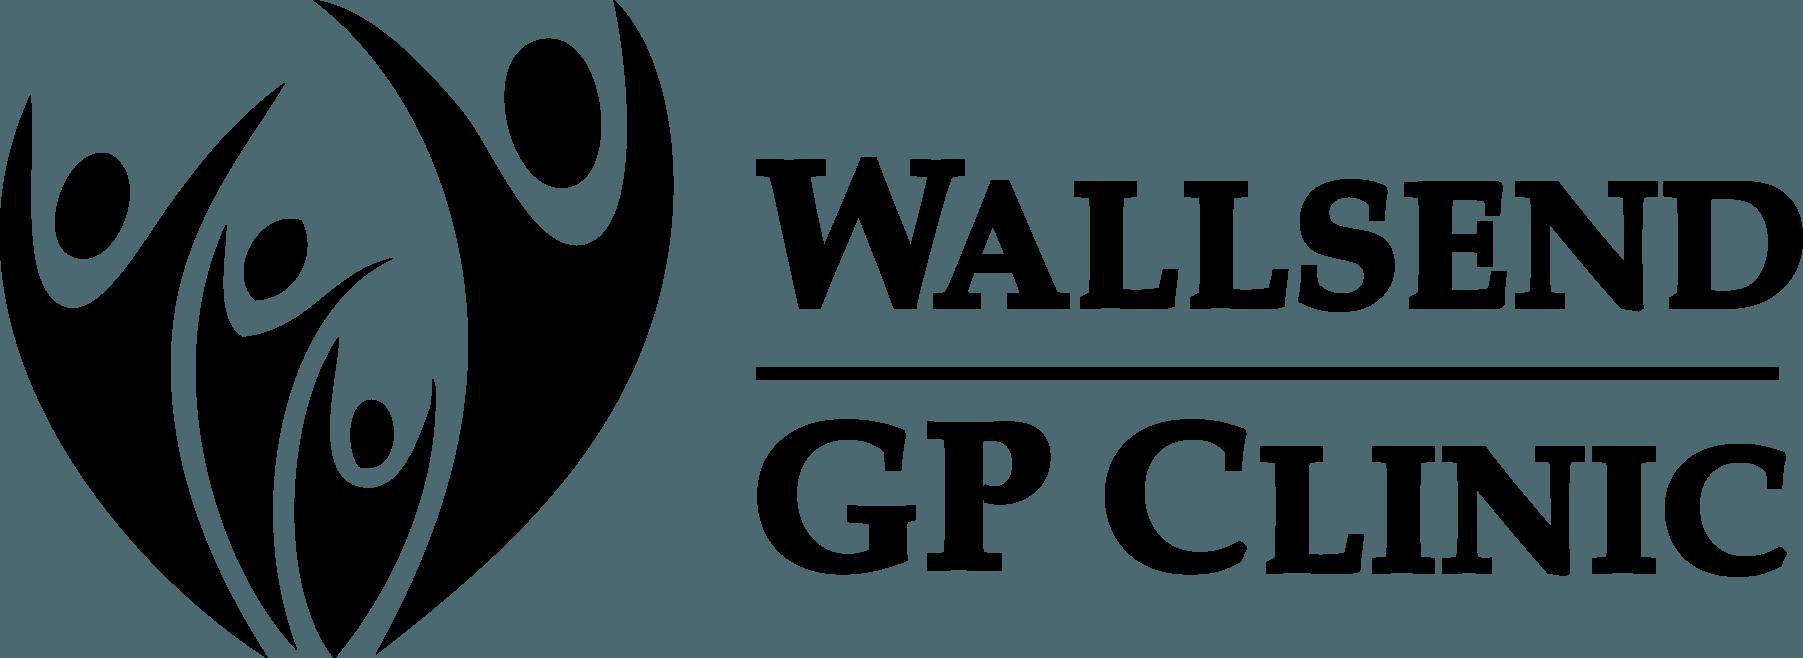 wallsend gp clinic logo